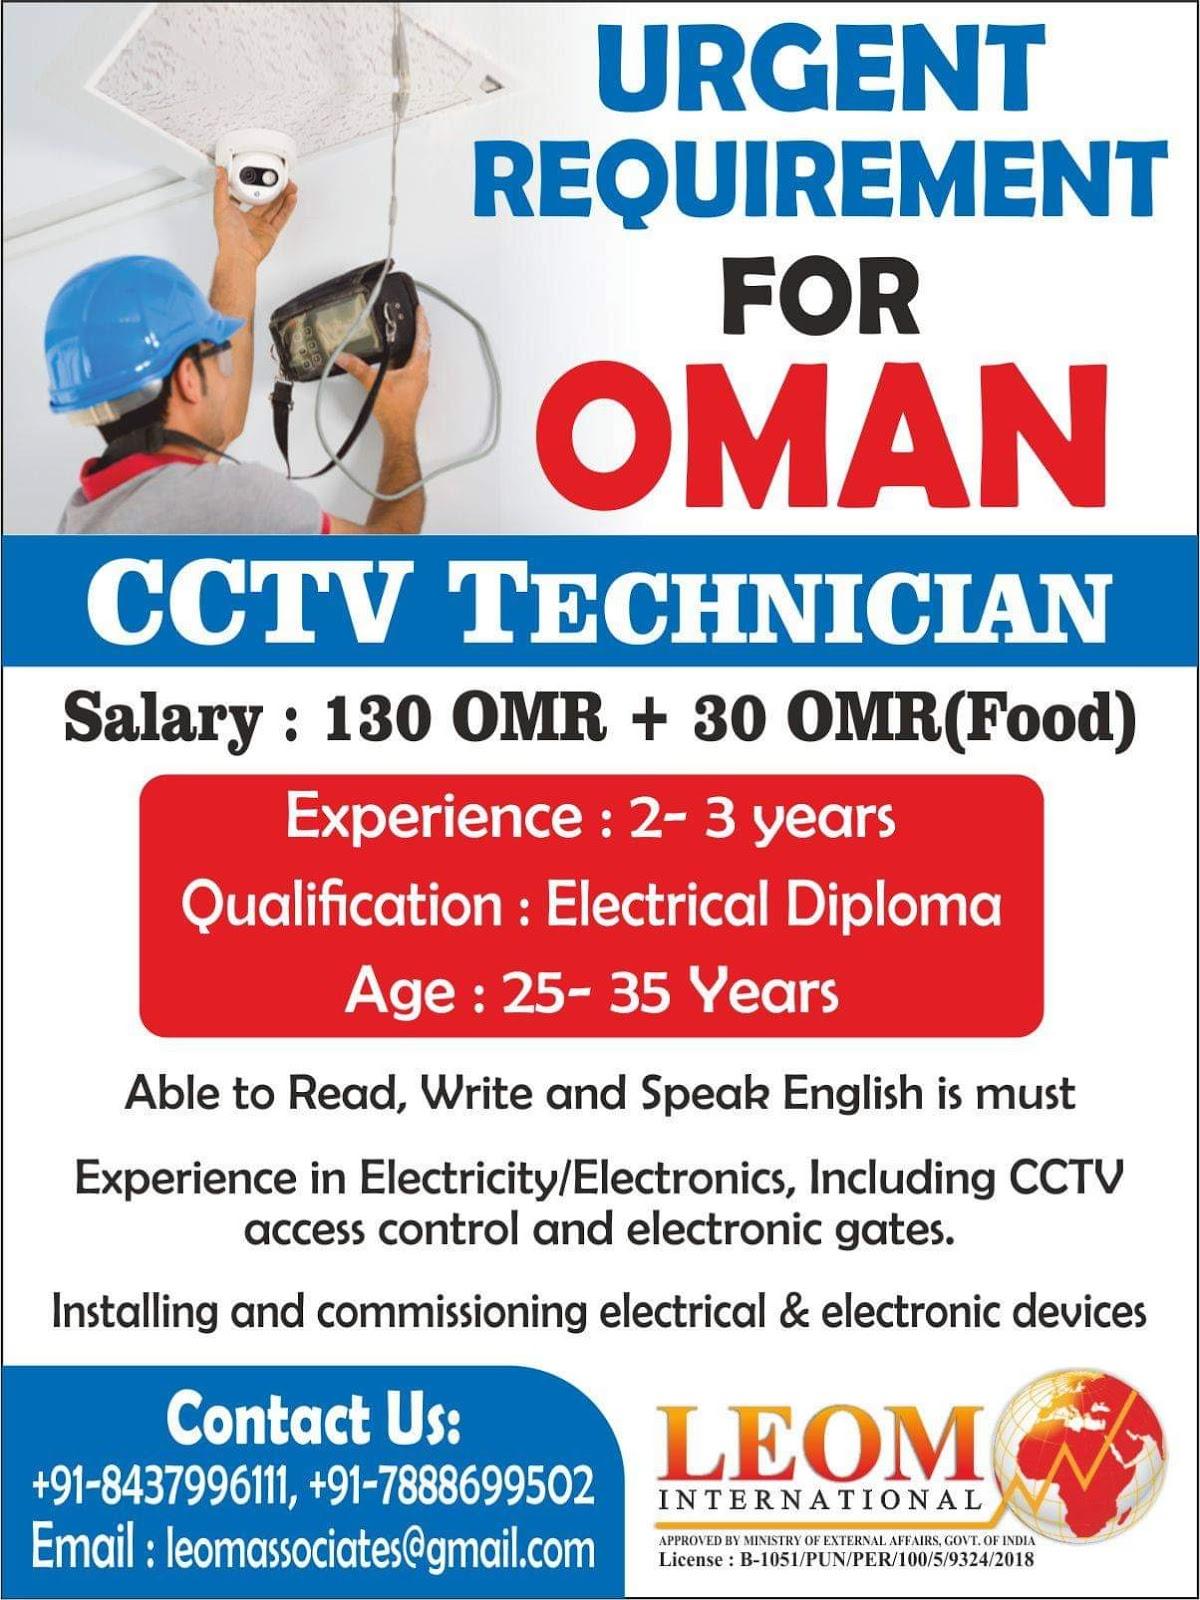 Urgent Requirement for Oman-CCTV Technician